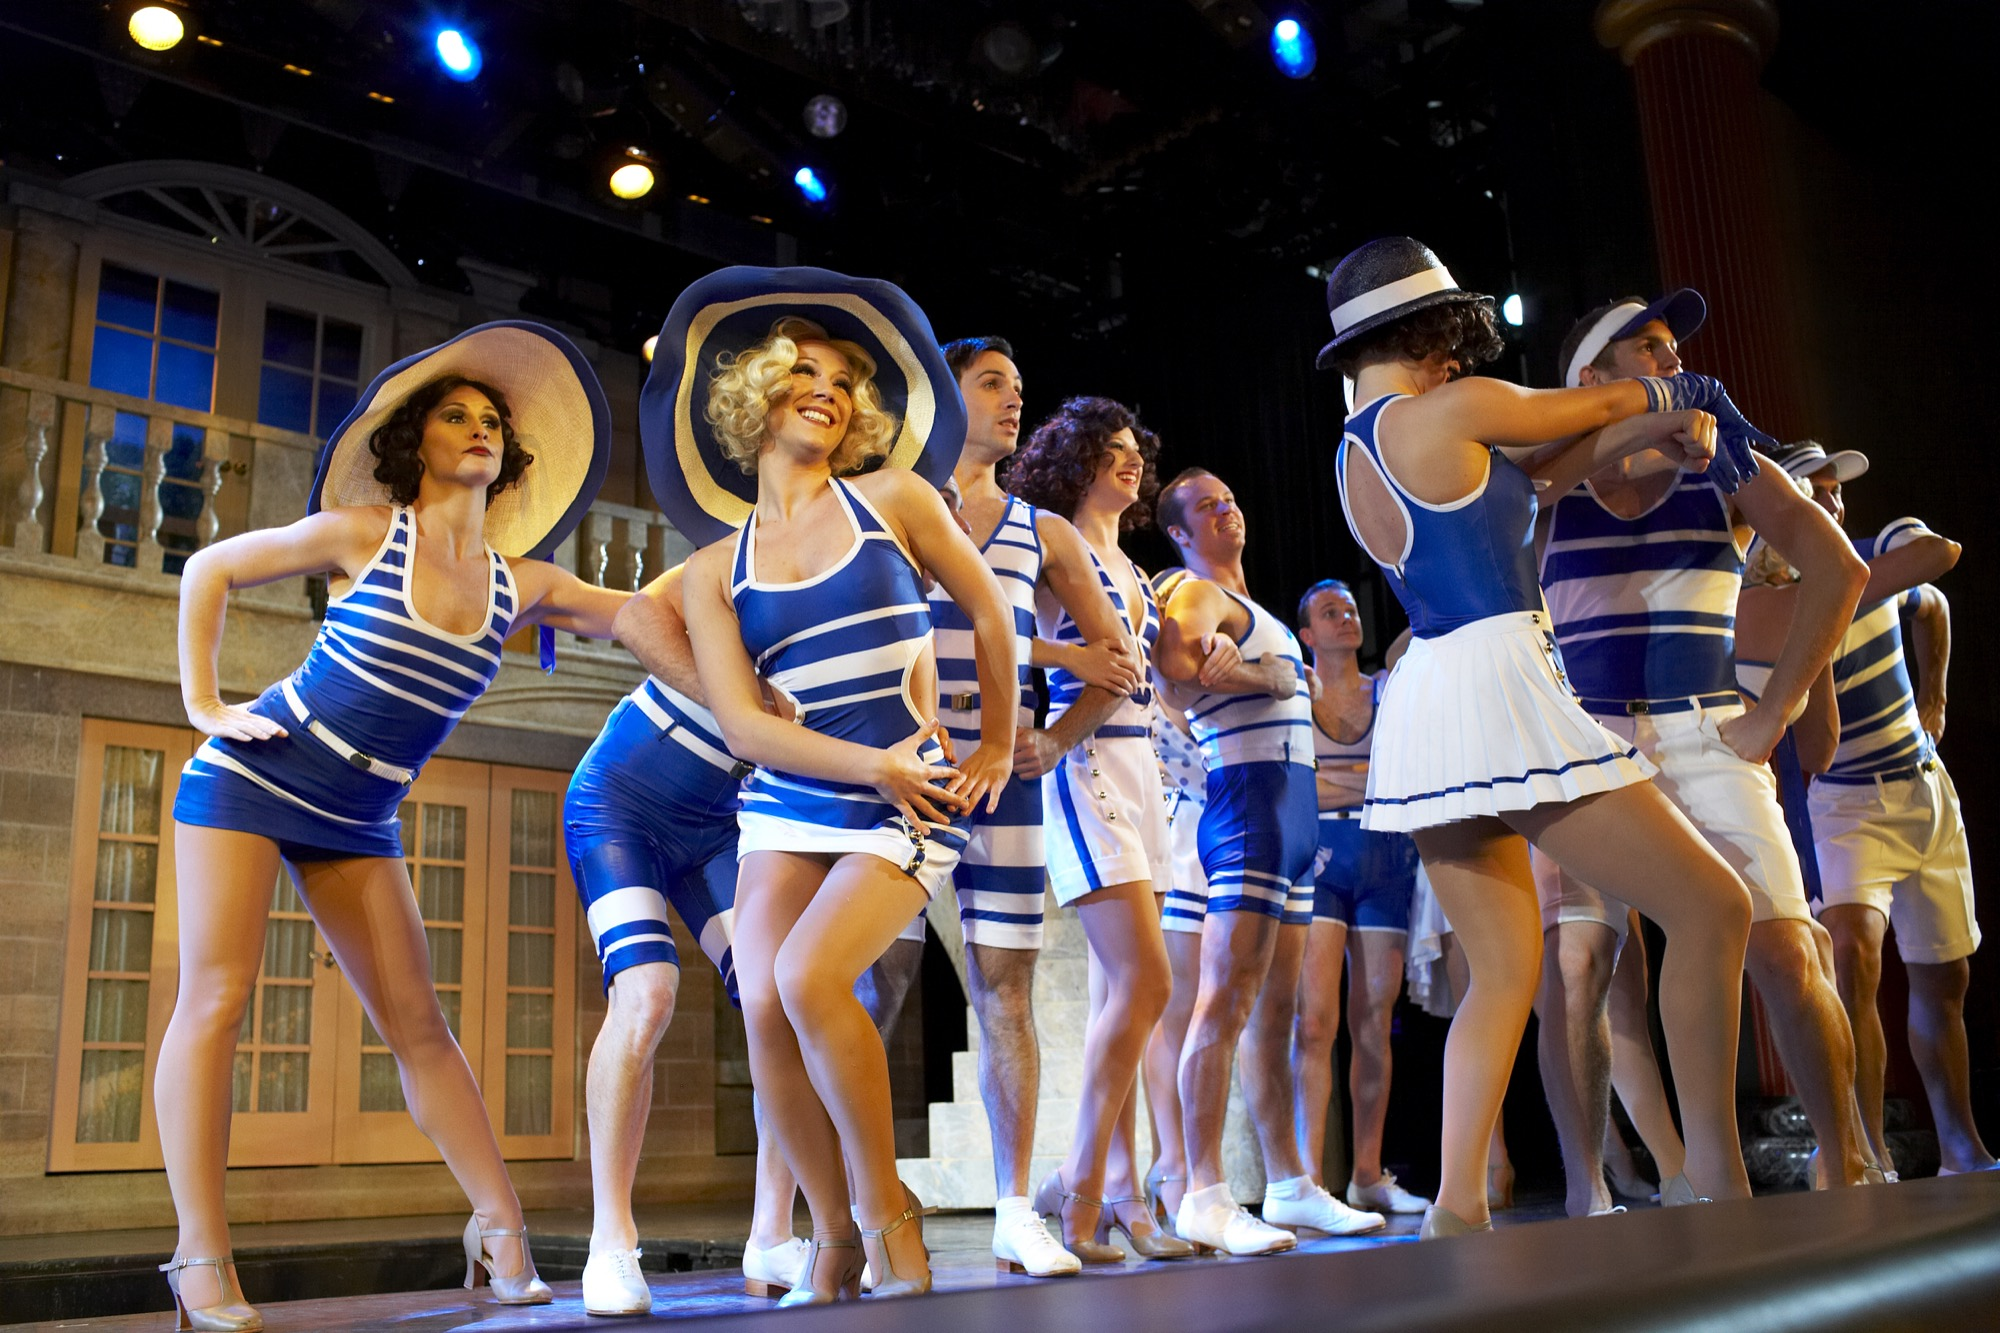 Princess Cruises Coral Class Interior show 3.jpg